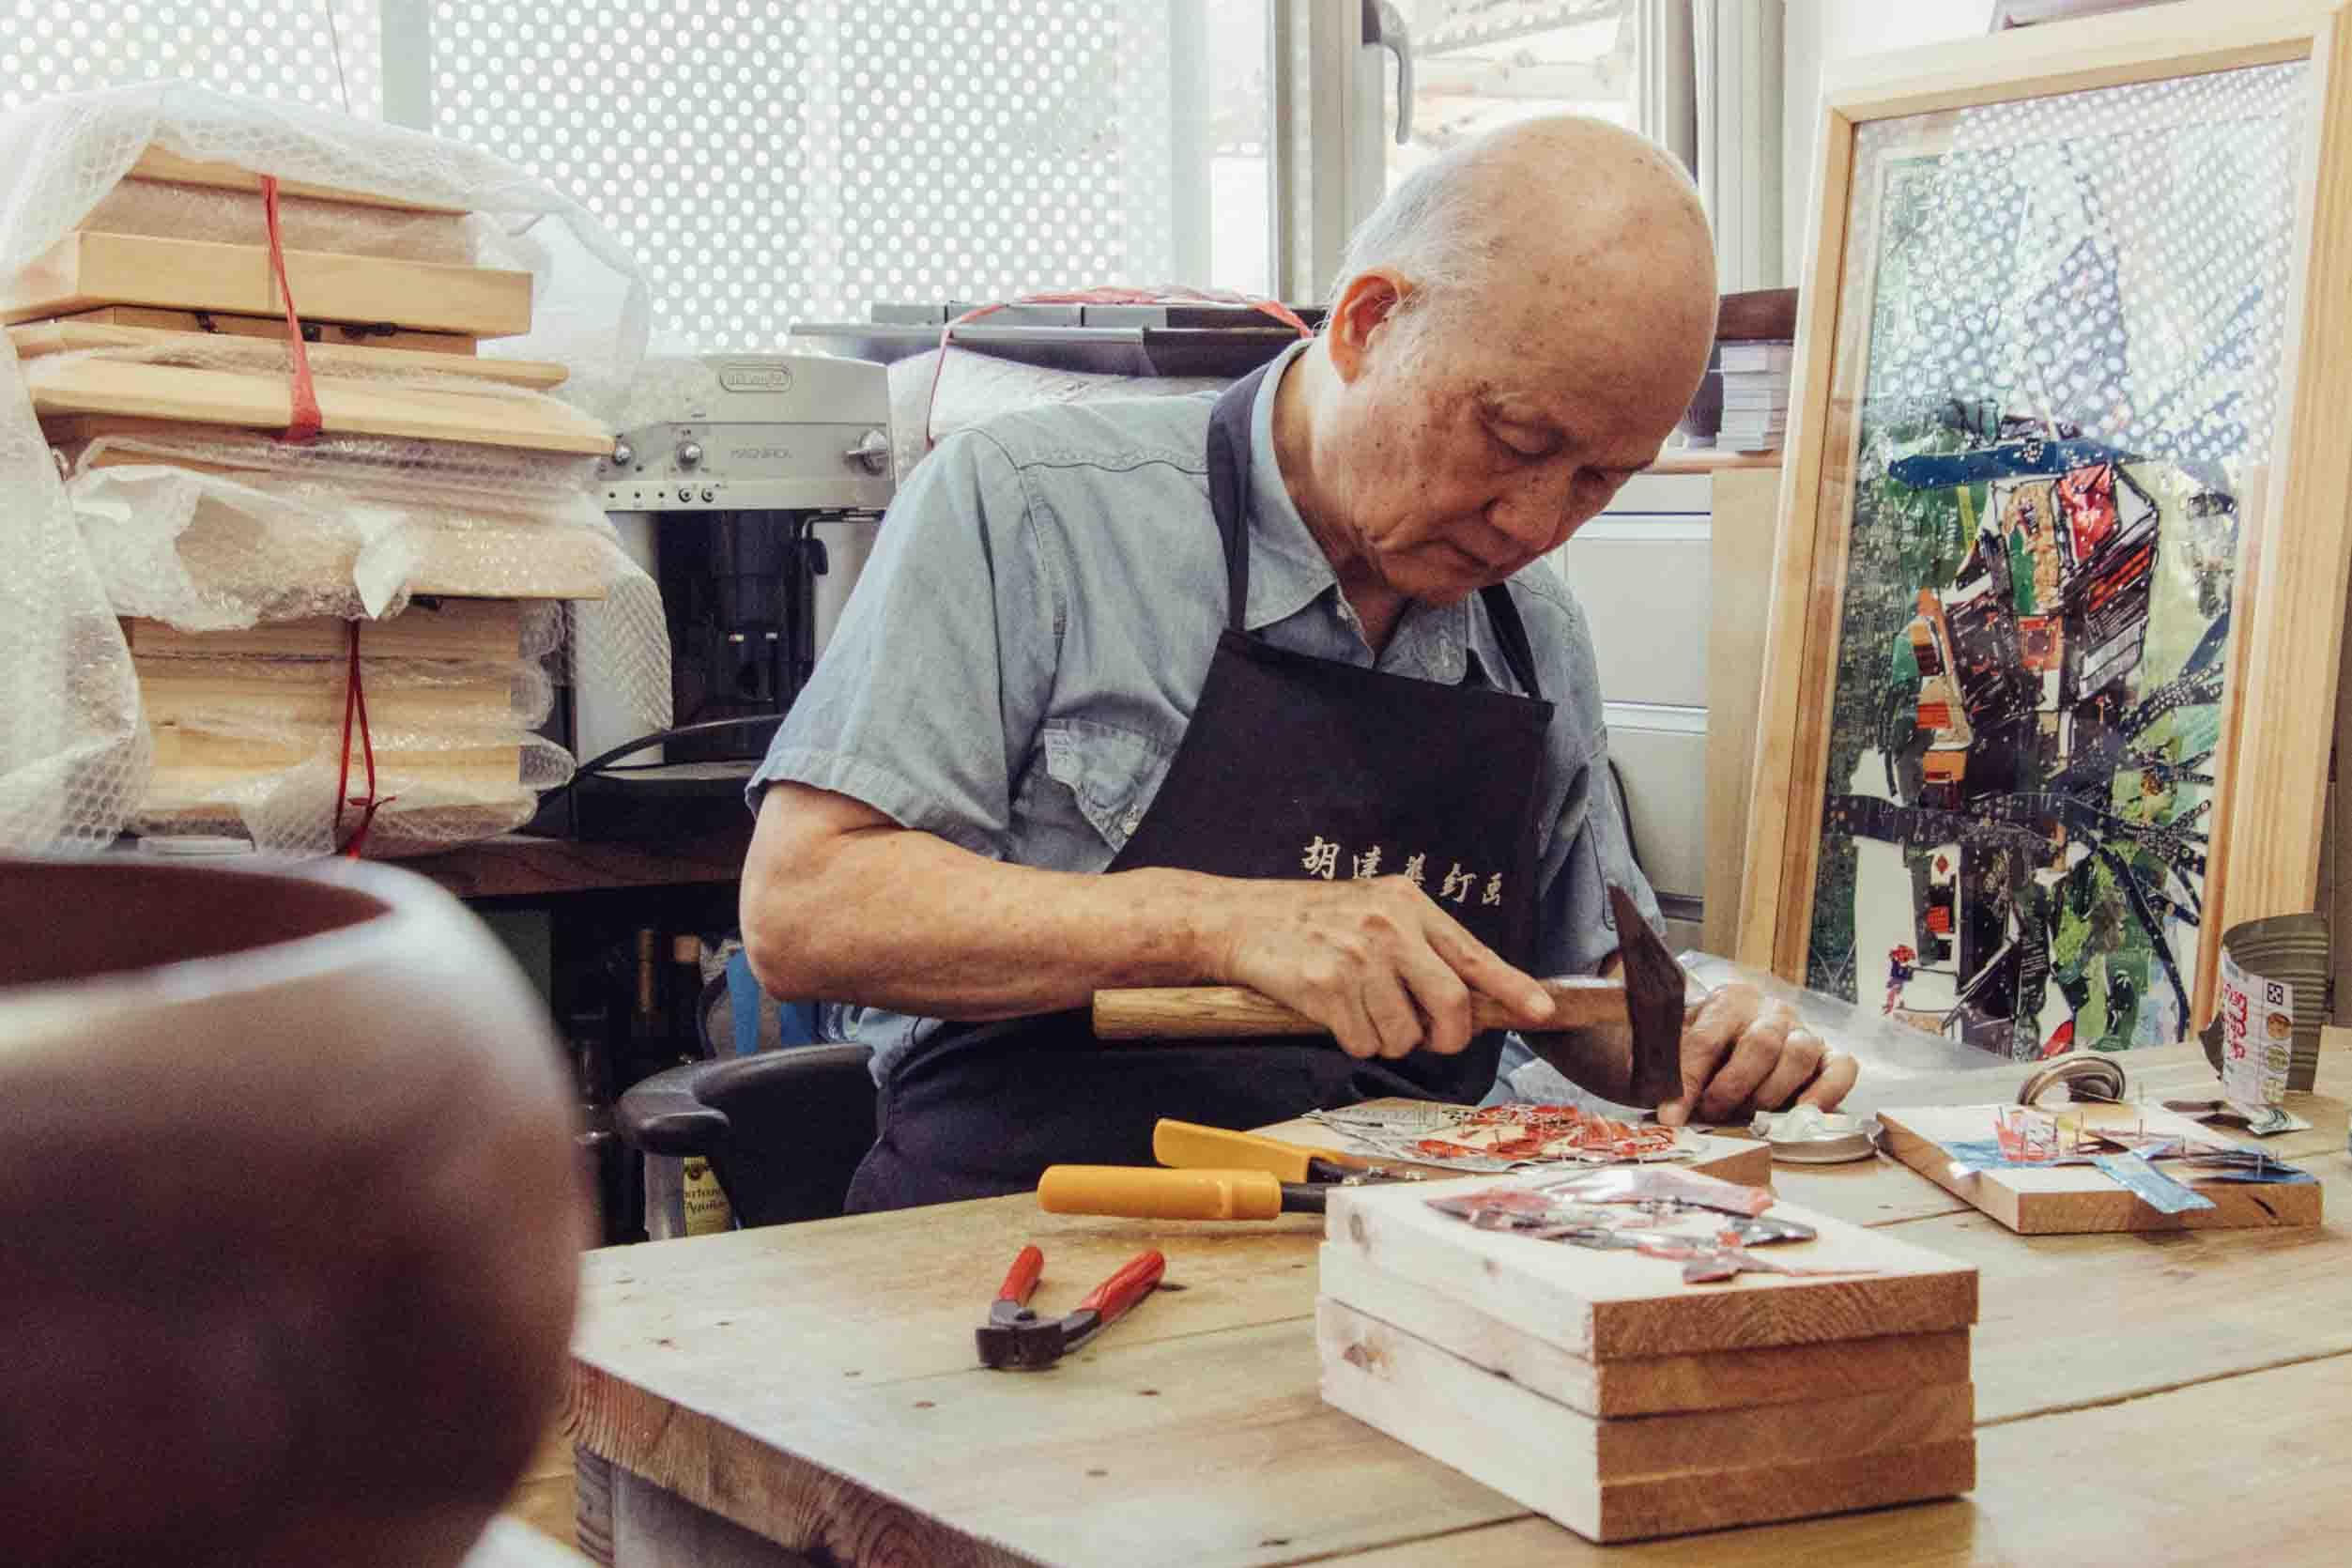 OwlStay團隊邀請藝術家胡達華展示珍藏釘畫作品及開設工作坊